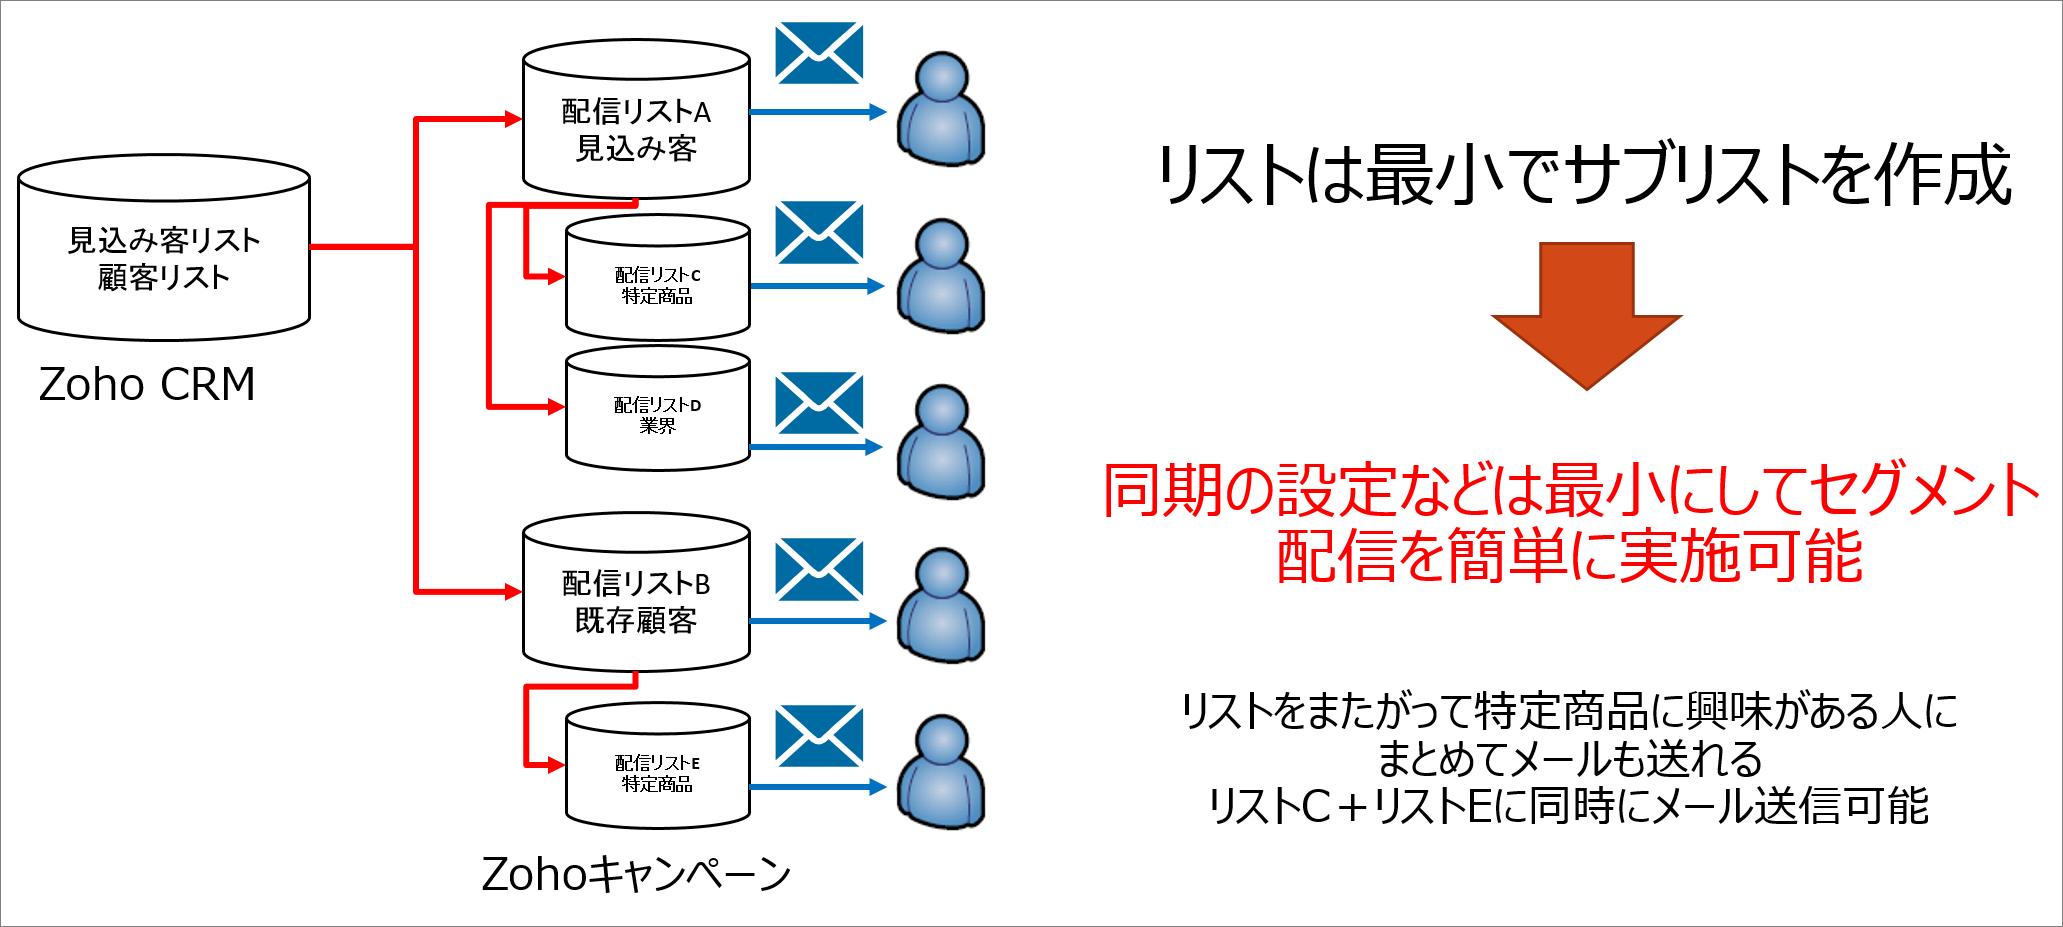 Zoho キャンペーンにおけるリスト管理